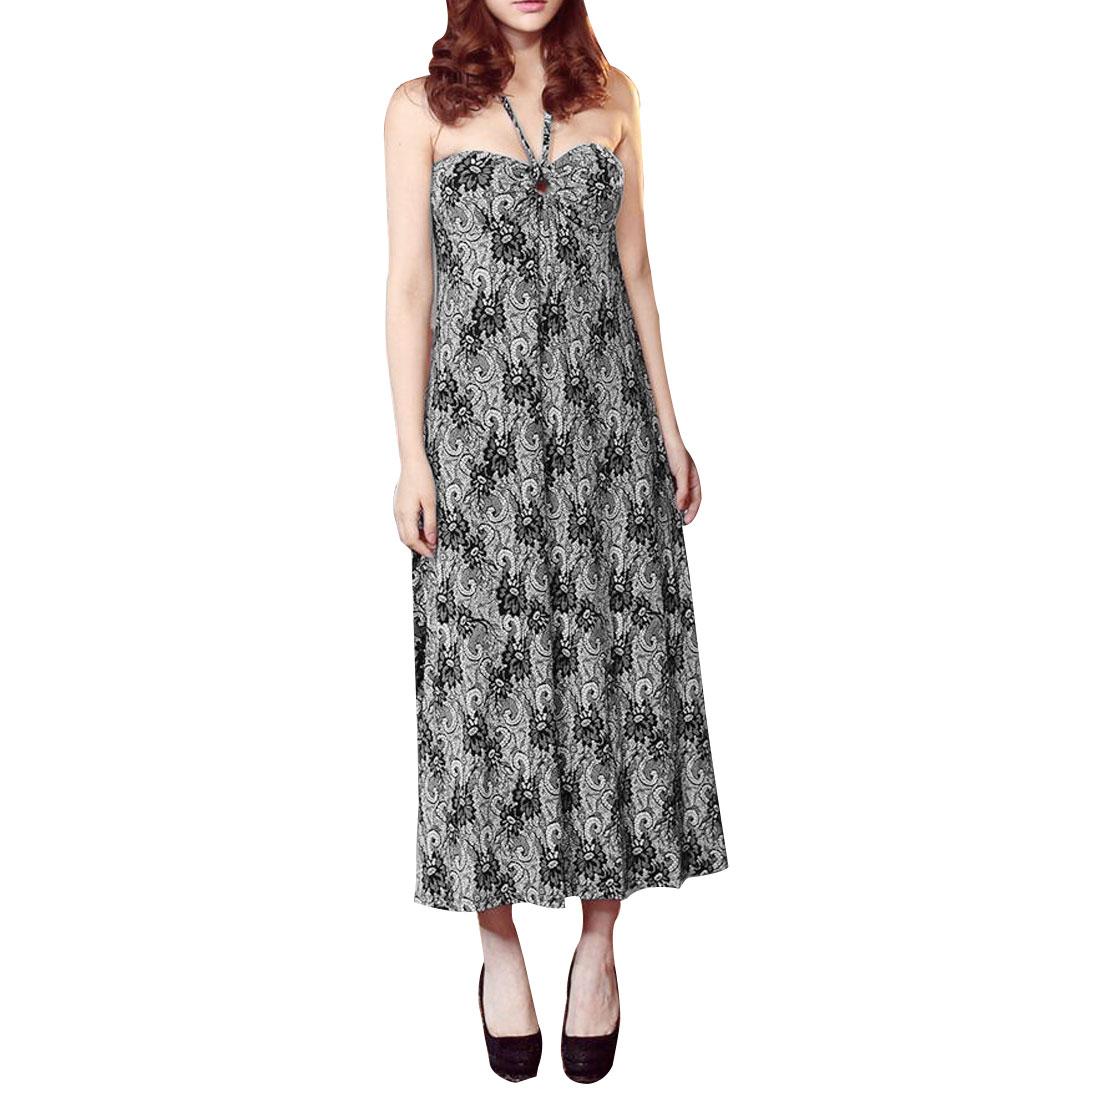 Ladies Sleeveless Black White Flowers Pattern Self Tie Halter Dress XS